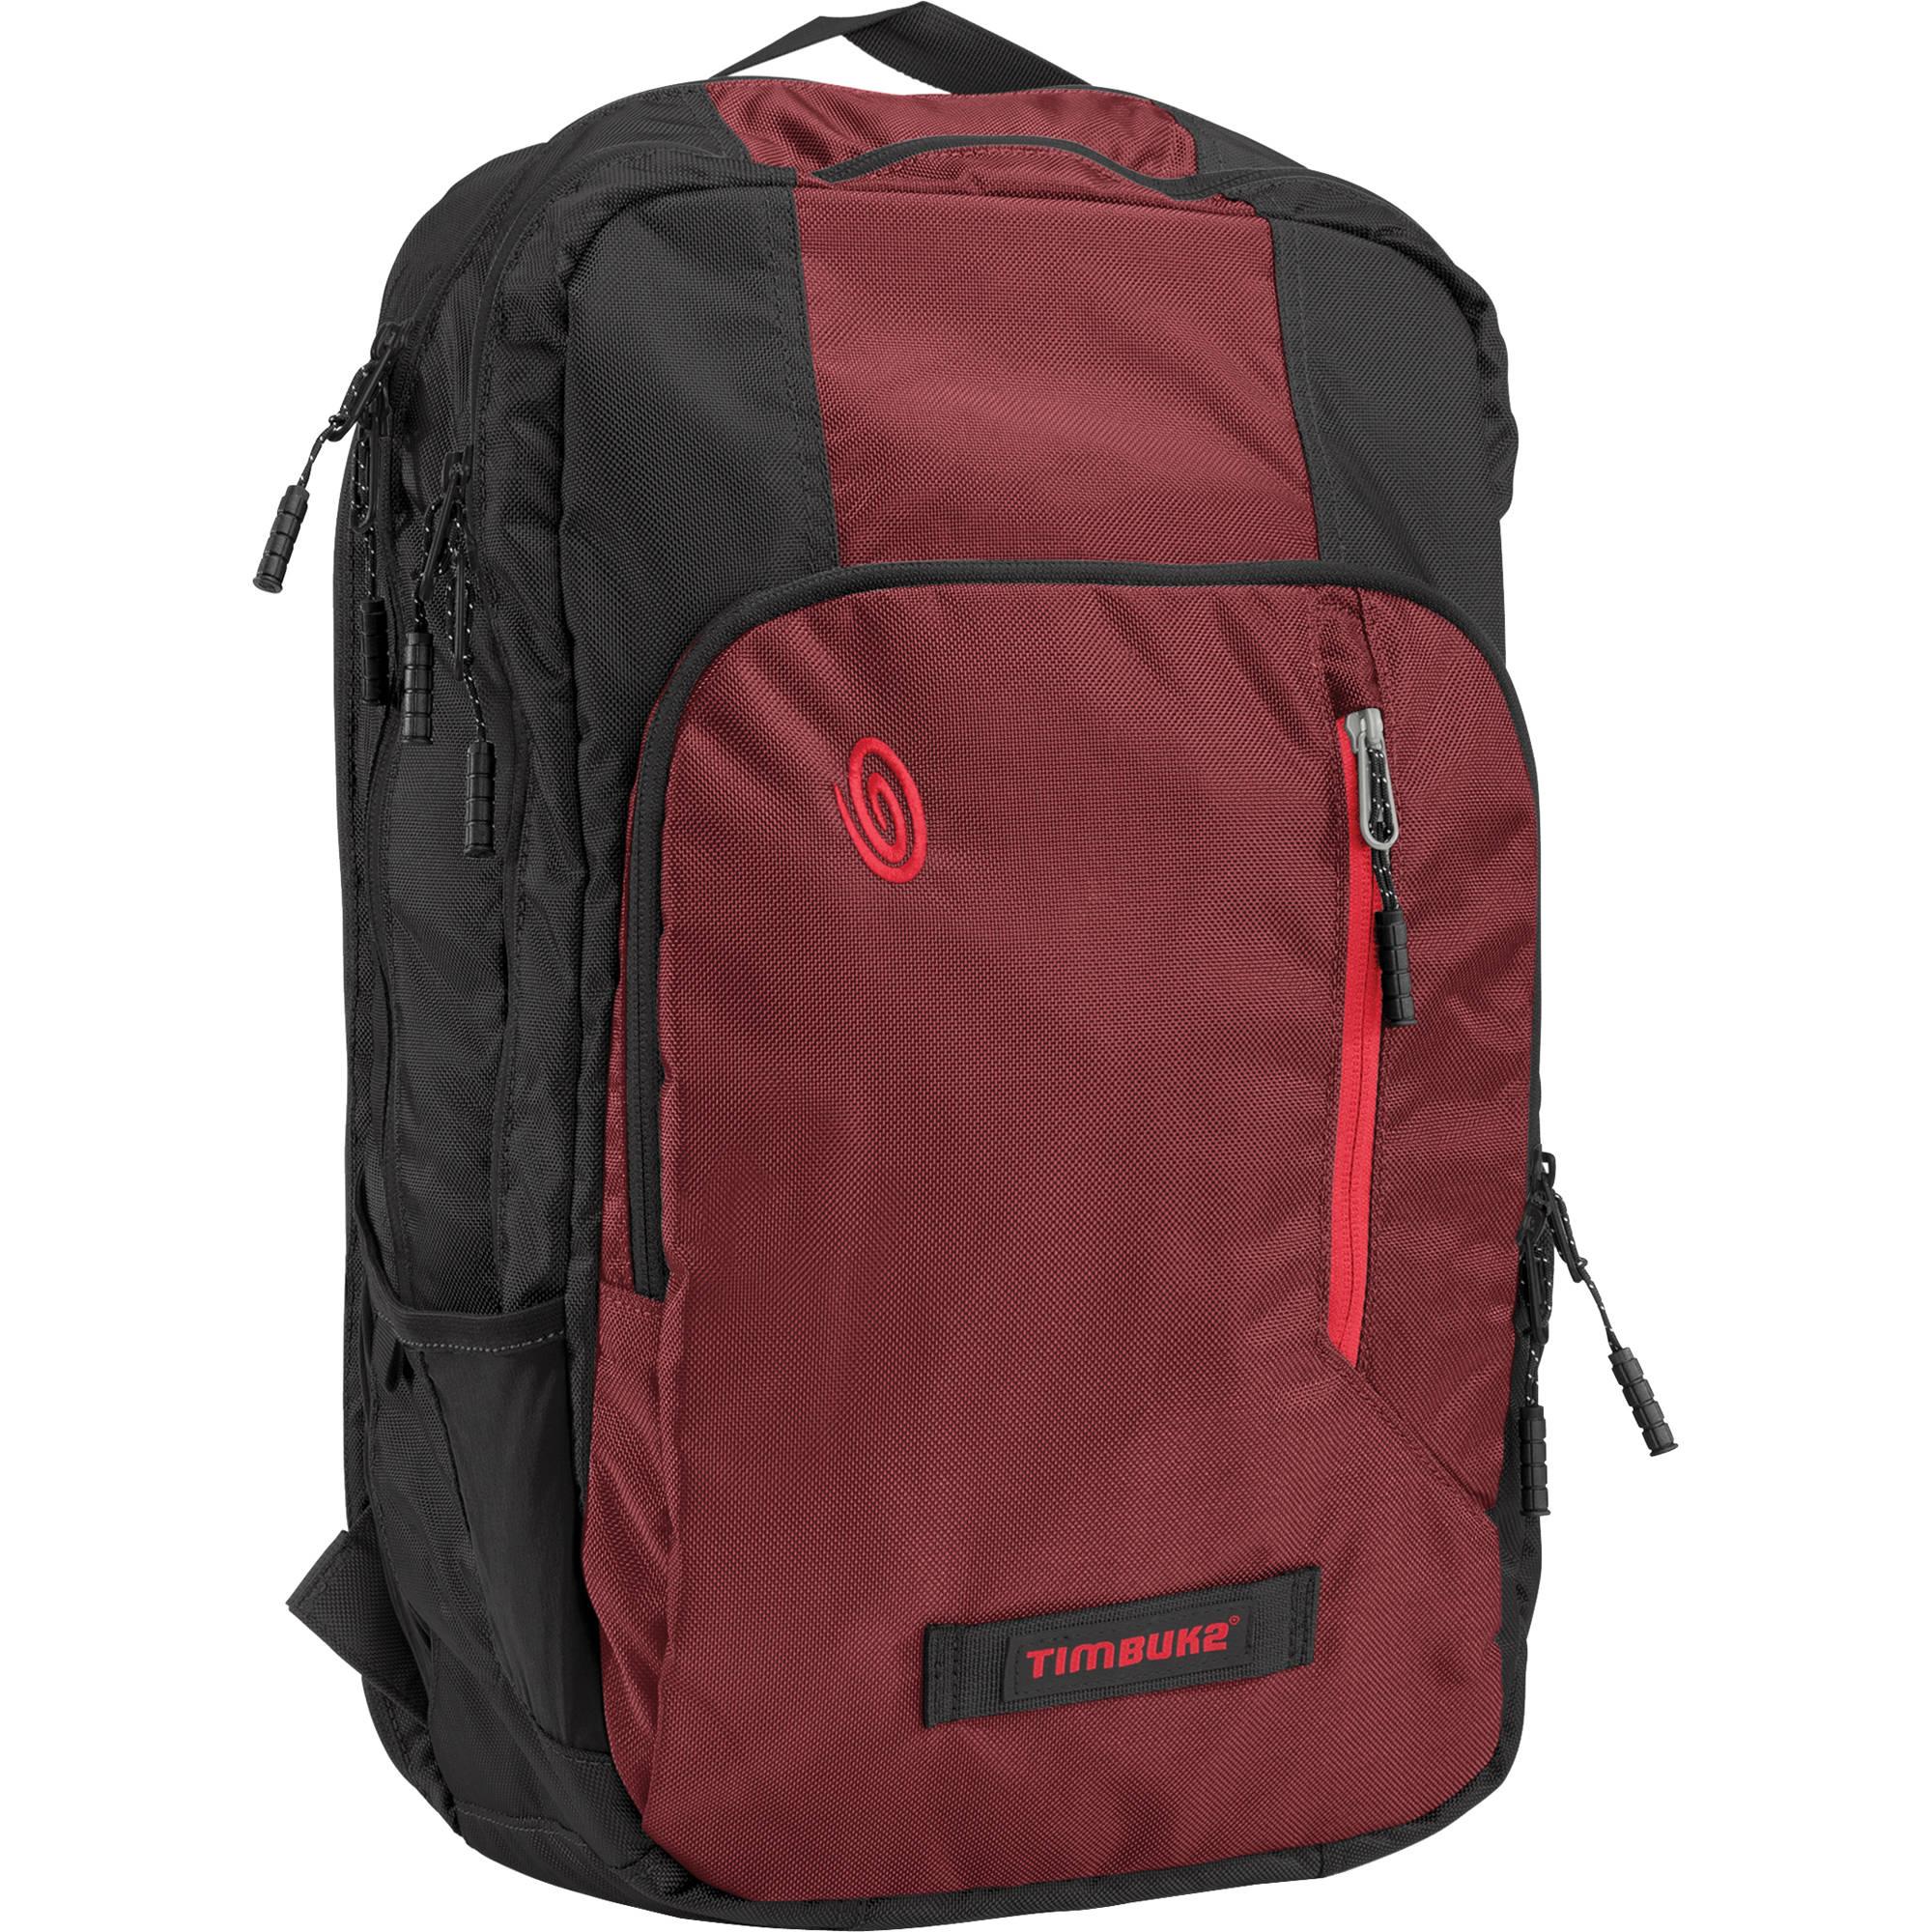 640bea911ee Timbuk2 Uptown Laptop TSA-Friendly Backpack (Red) 347-3-6061 B&H